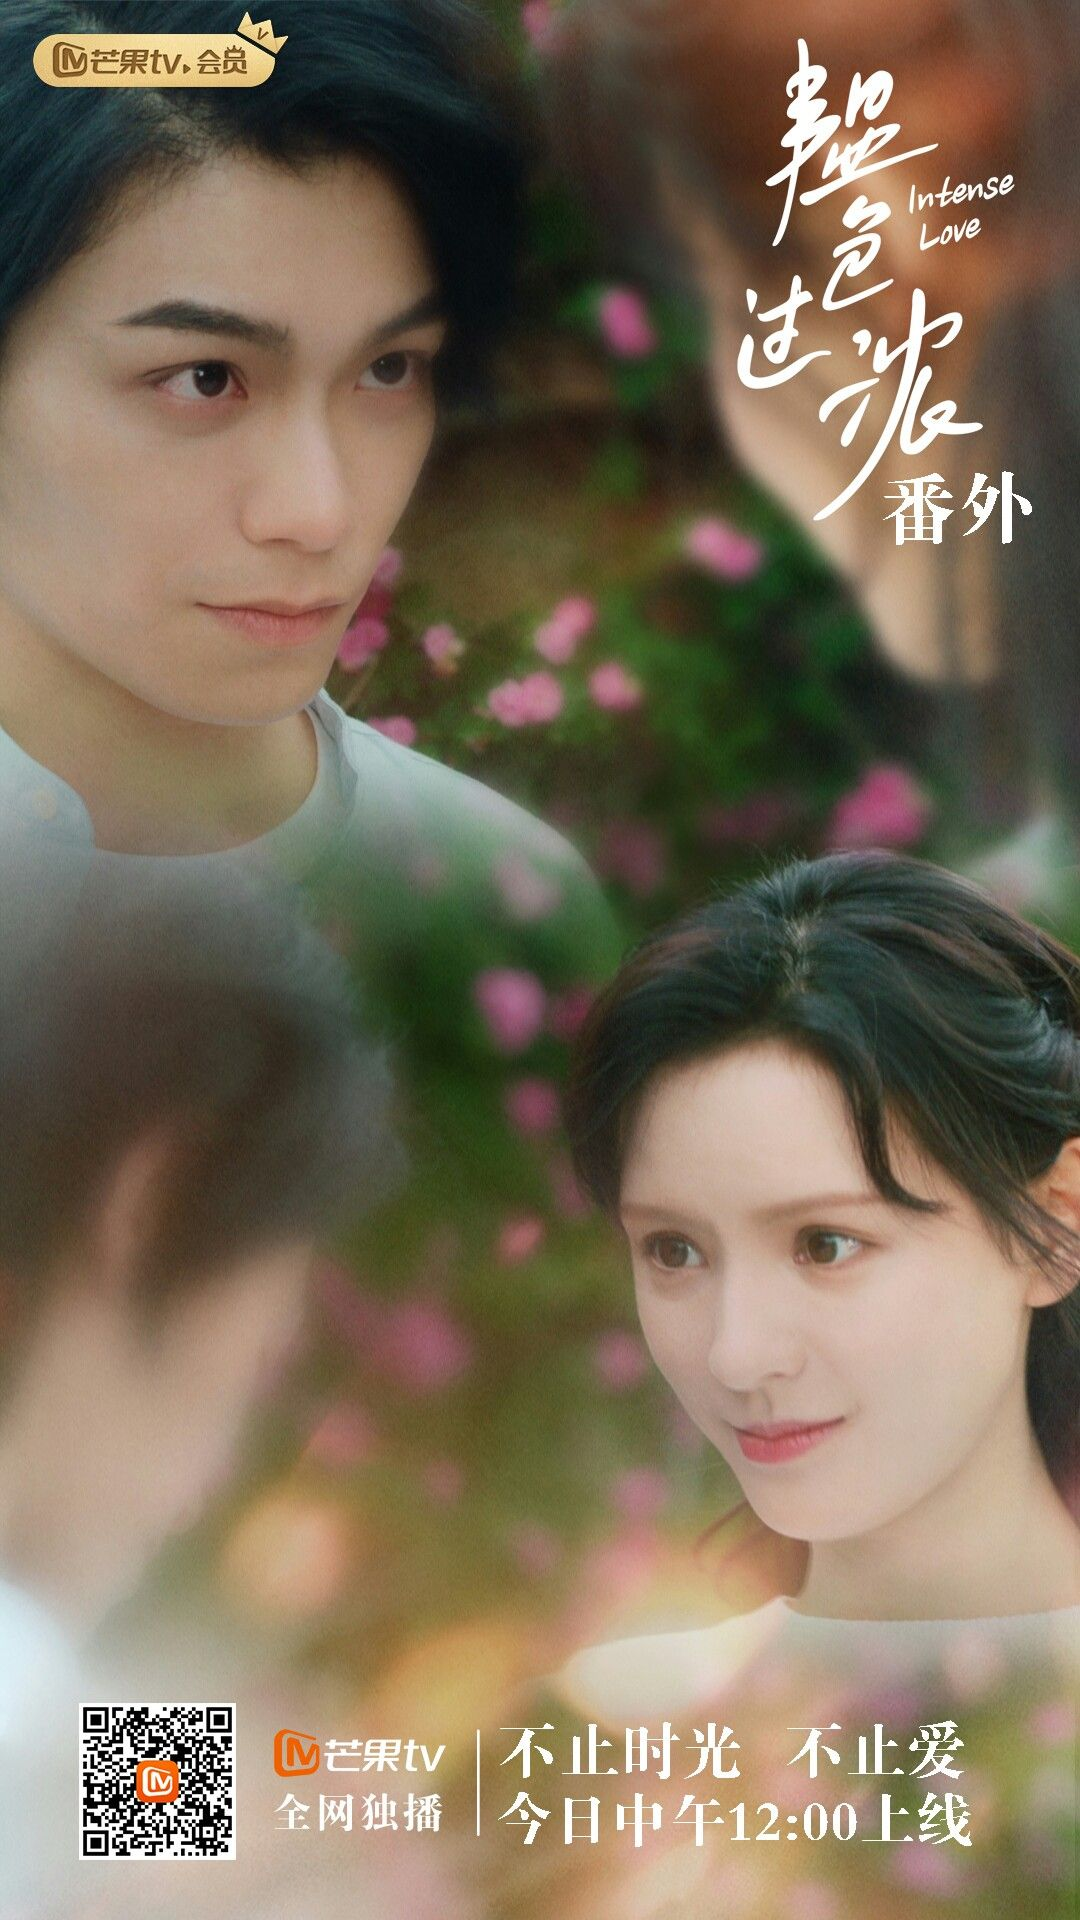 Pin by winniC on 陸劇 in 2020 Intense love, Intense, Yuxi